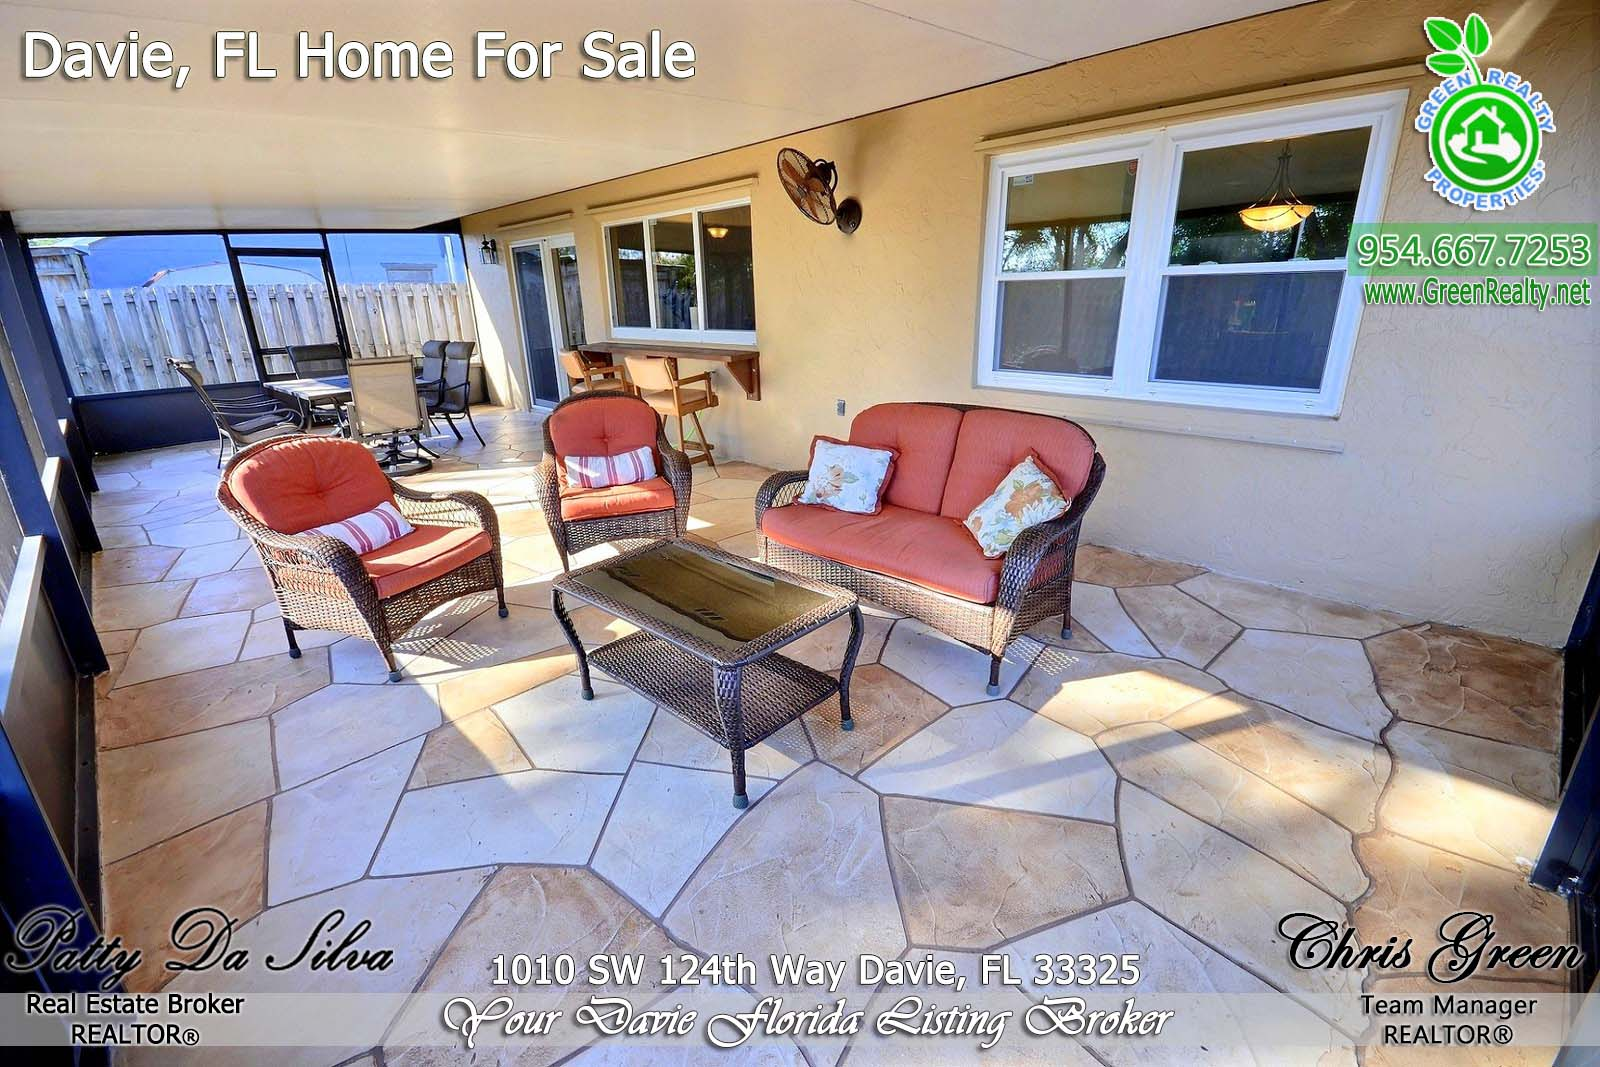 29 Davie Real Estate For Sale (3)